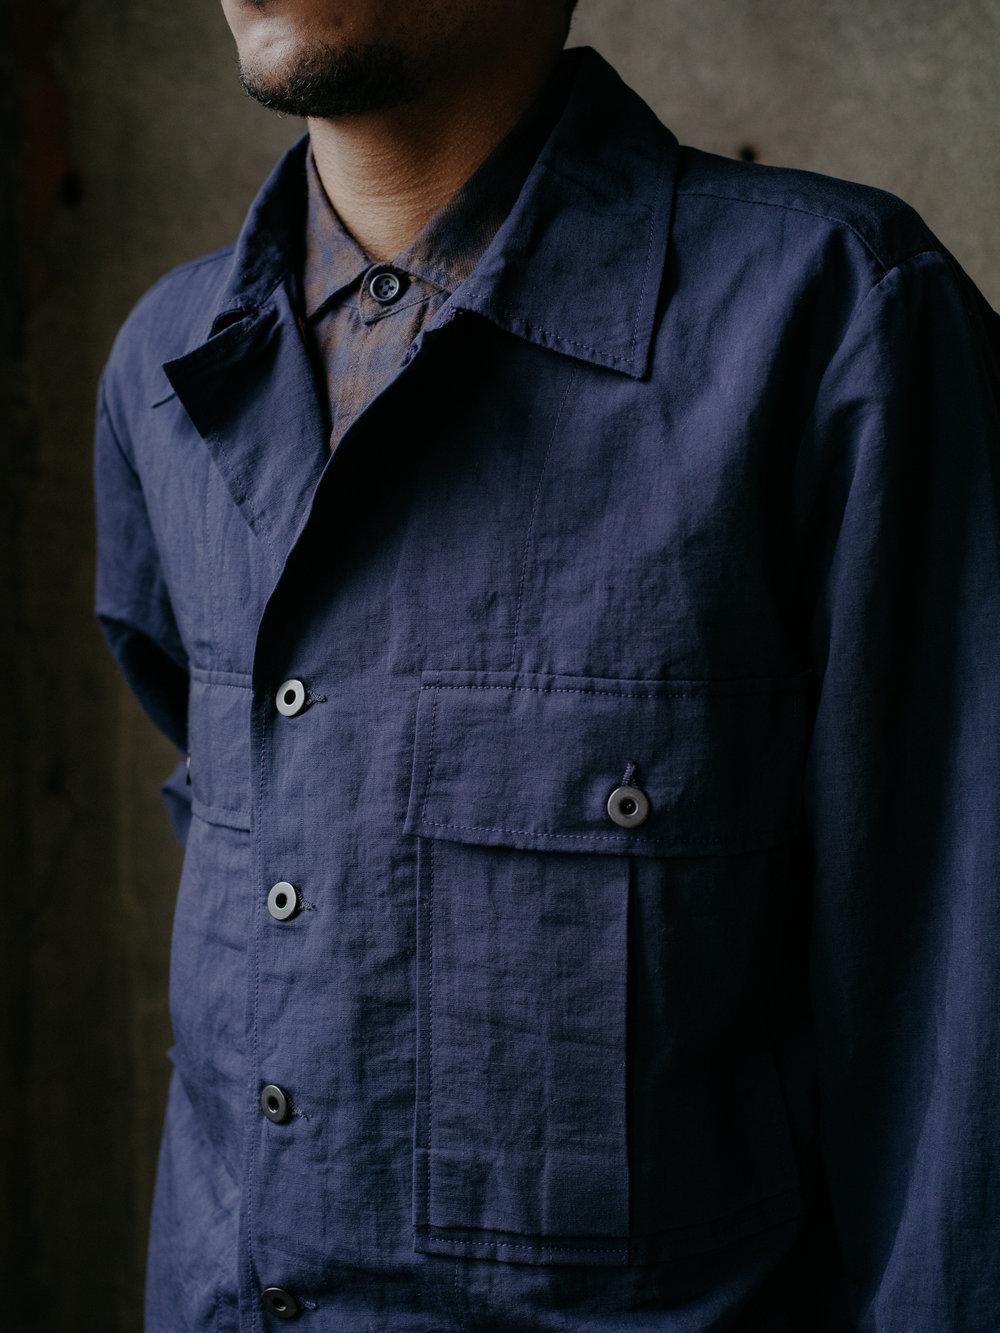 evan-kinori-bellow-pocket-jacket-nylon-linen-4